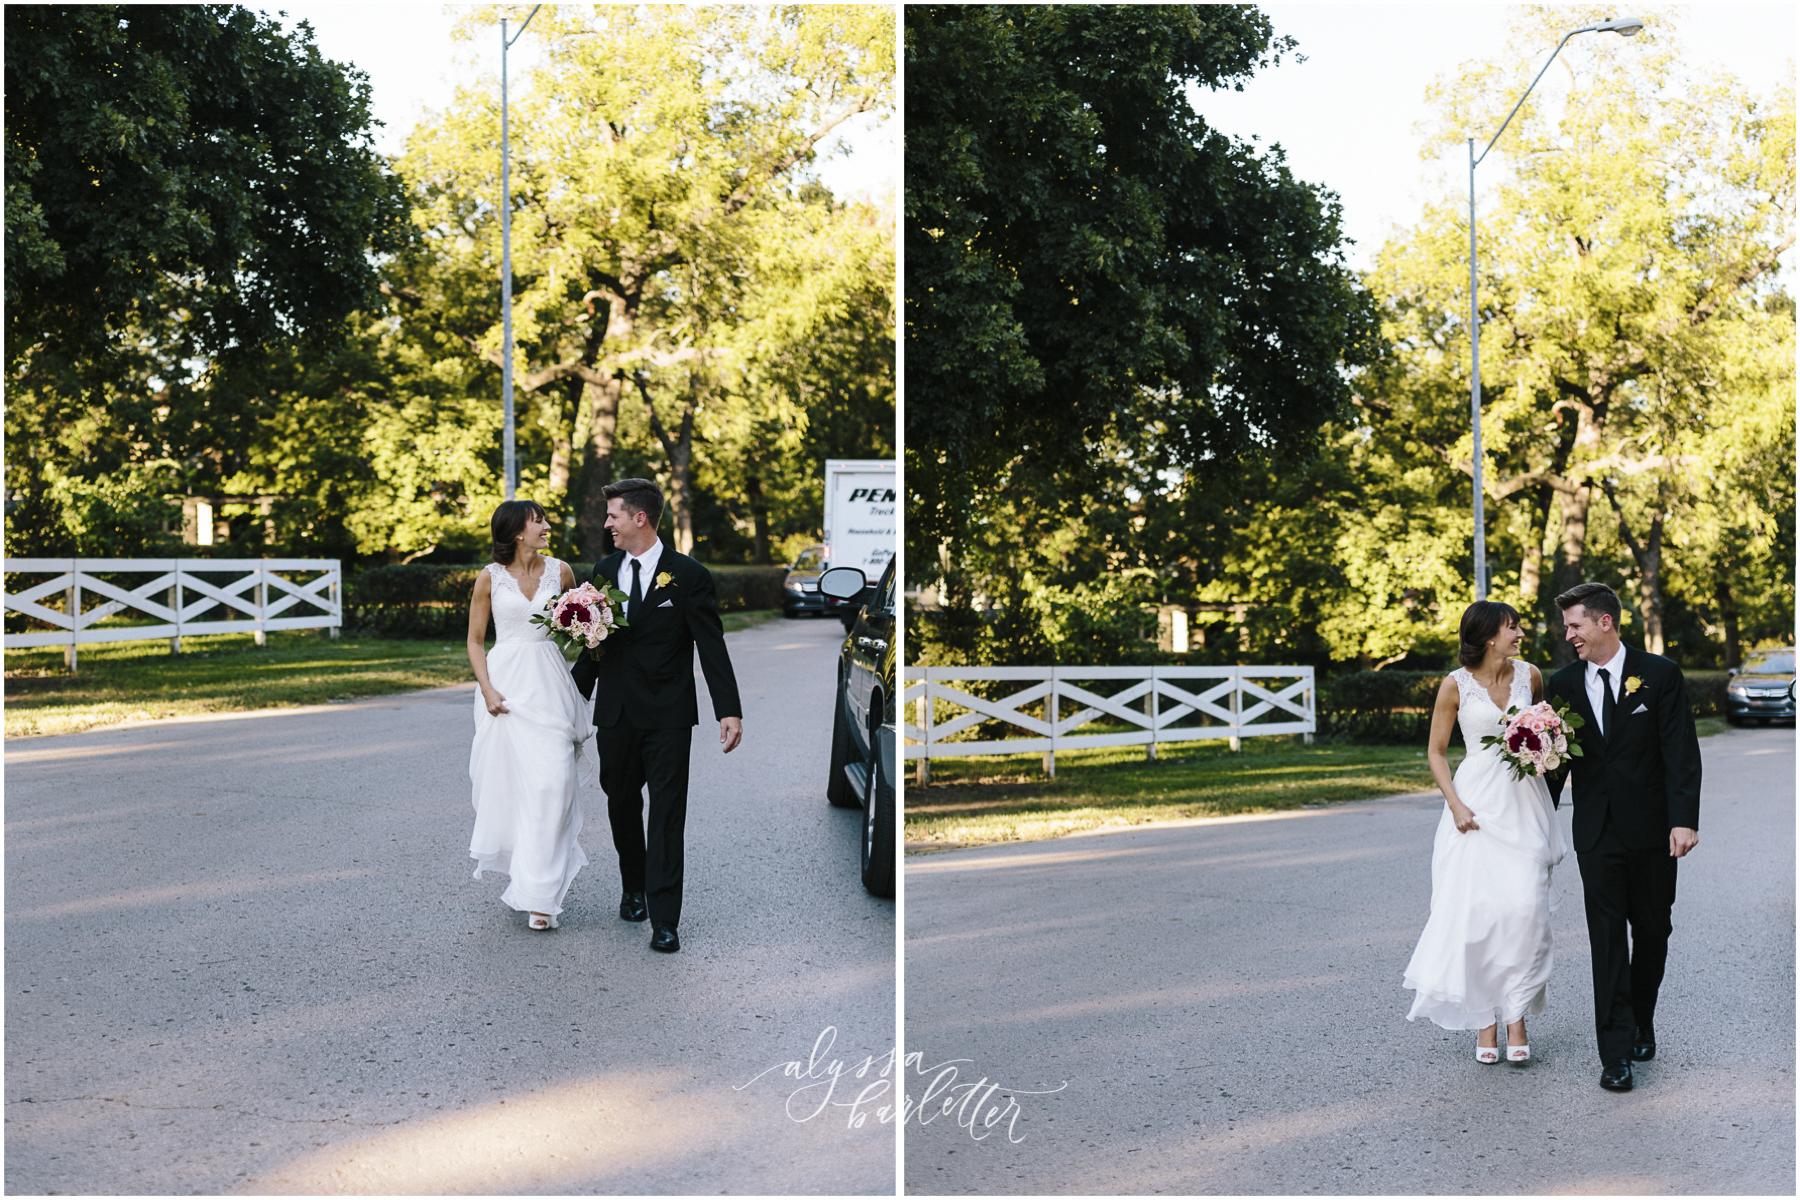 alyssa barletter wedding photography traditional downtown kansas city-27-24.jpg